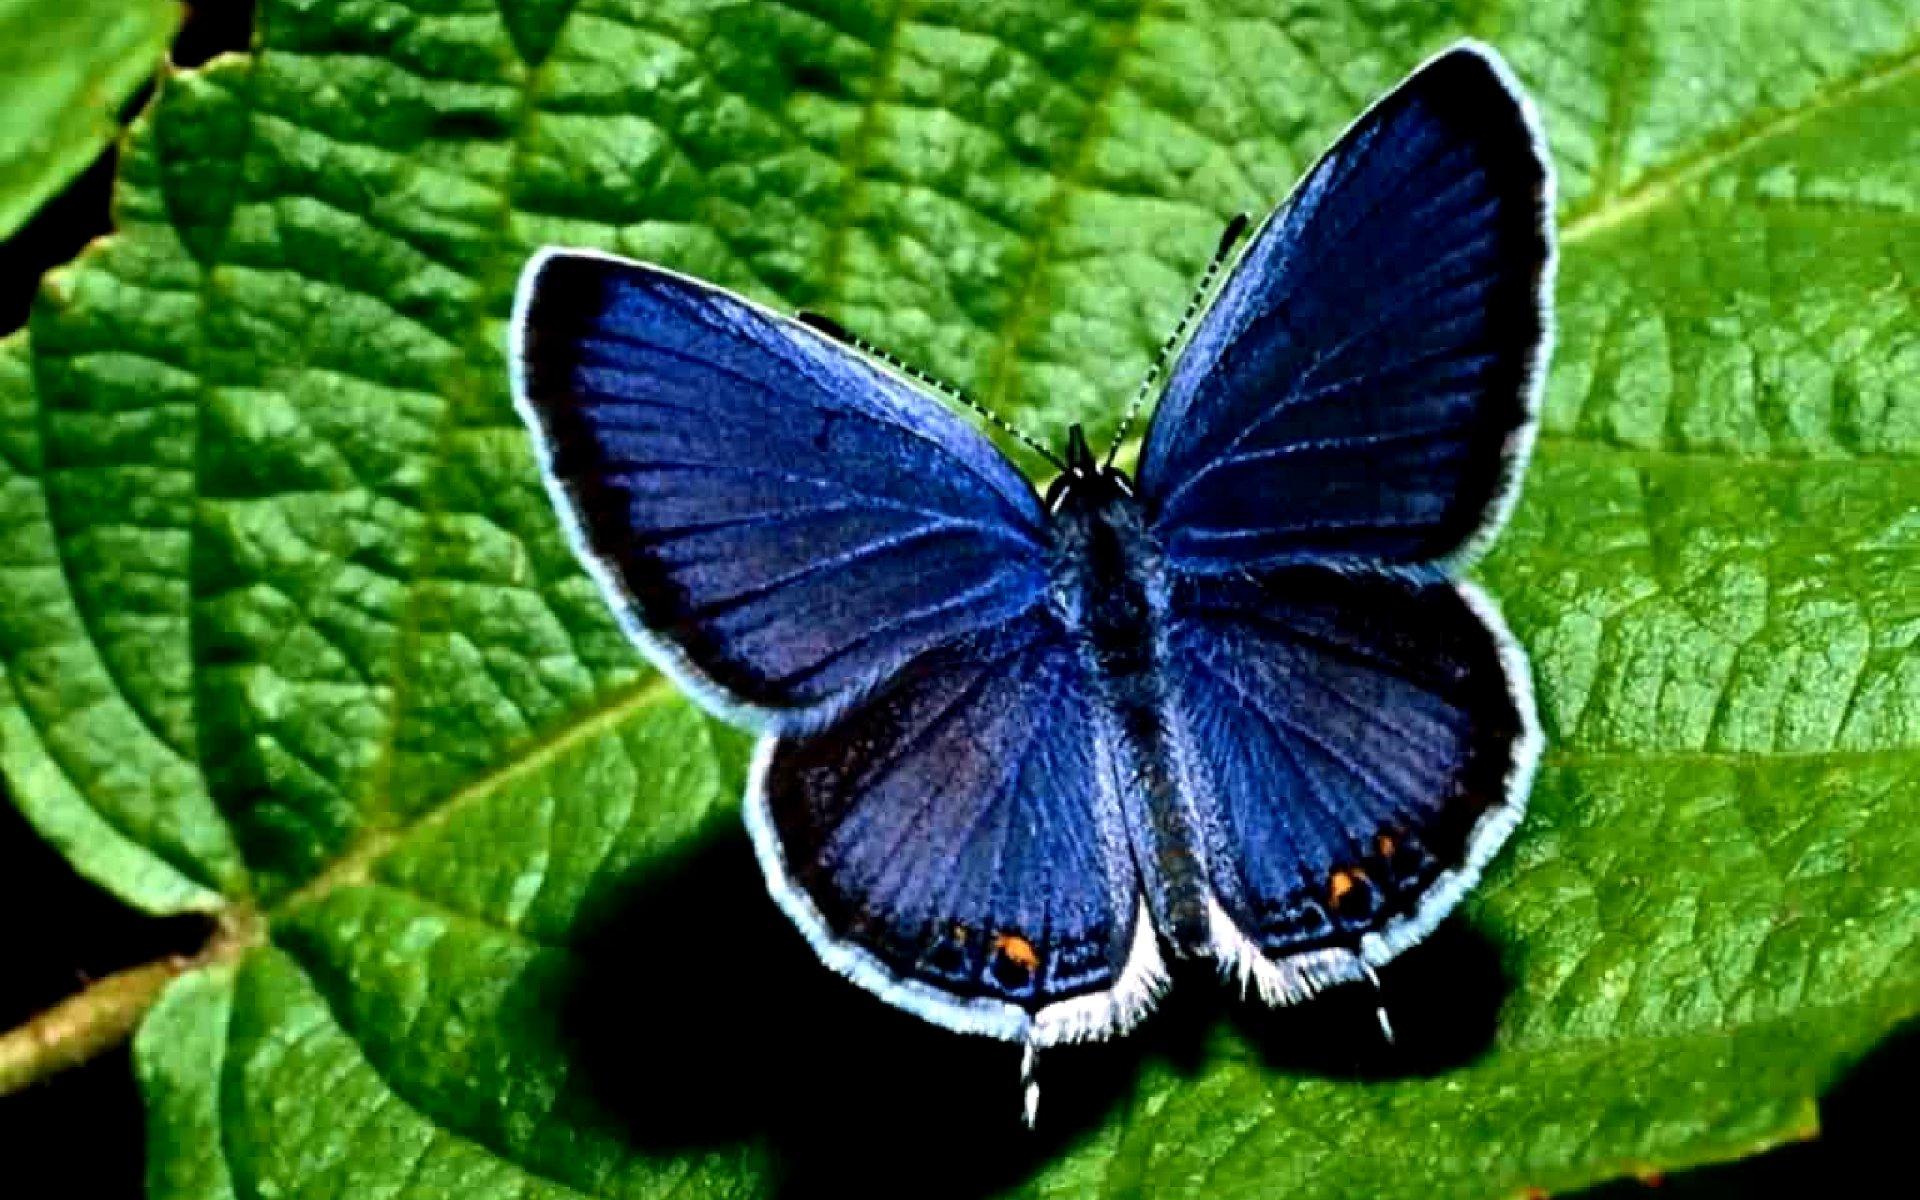 http://www.kartinki24.ru/uploads/gallery/main/217/kartinki24_ru_butterflies_87.jpg